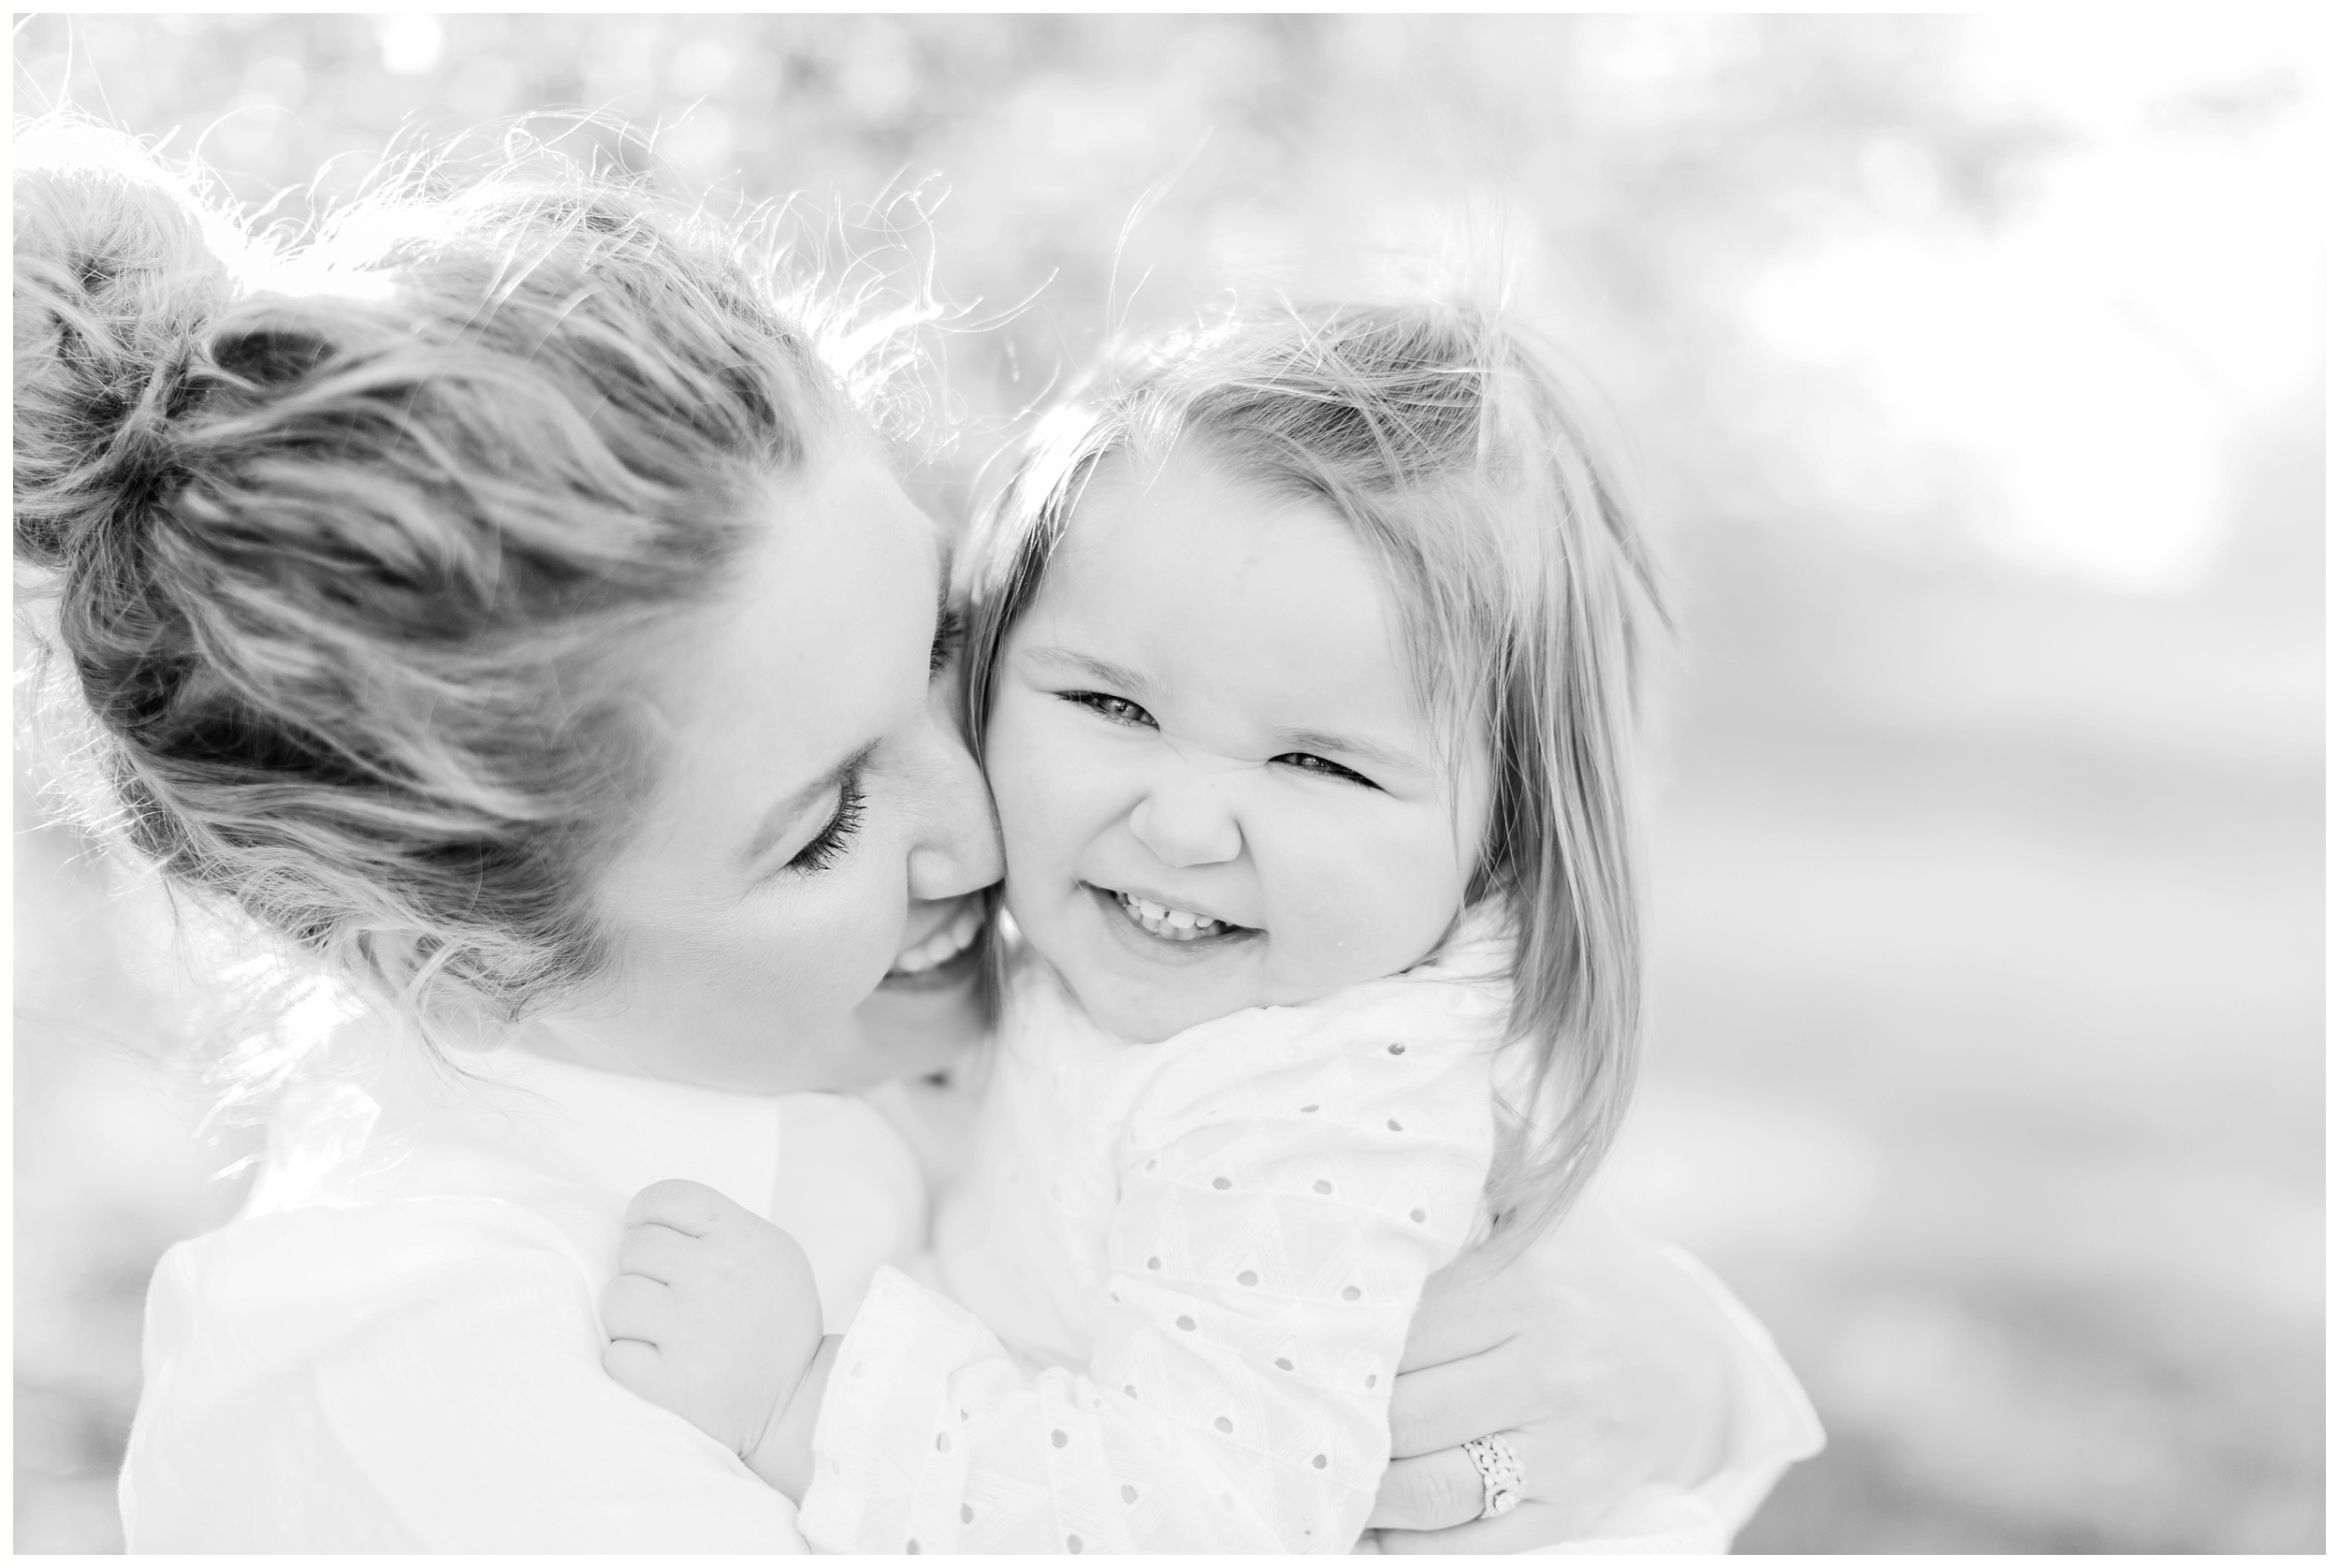 lexington-ky-family-lifestyle-mom-and-daughter-university-of-ky-uk-arboretum-photos-by-priscilla-baierlein_0221.jpg